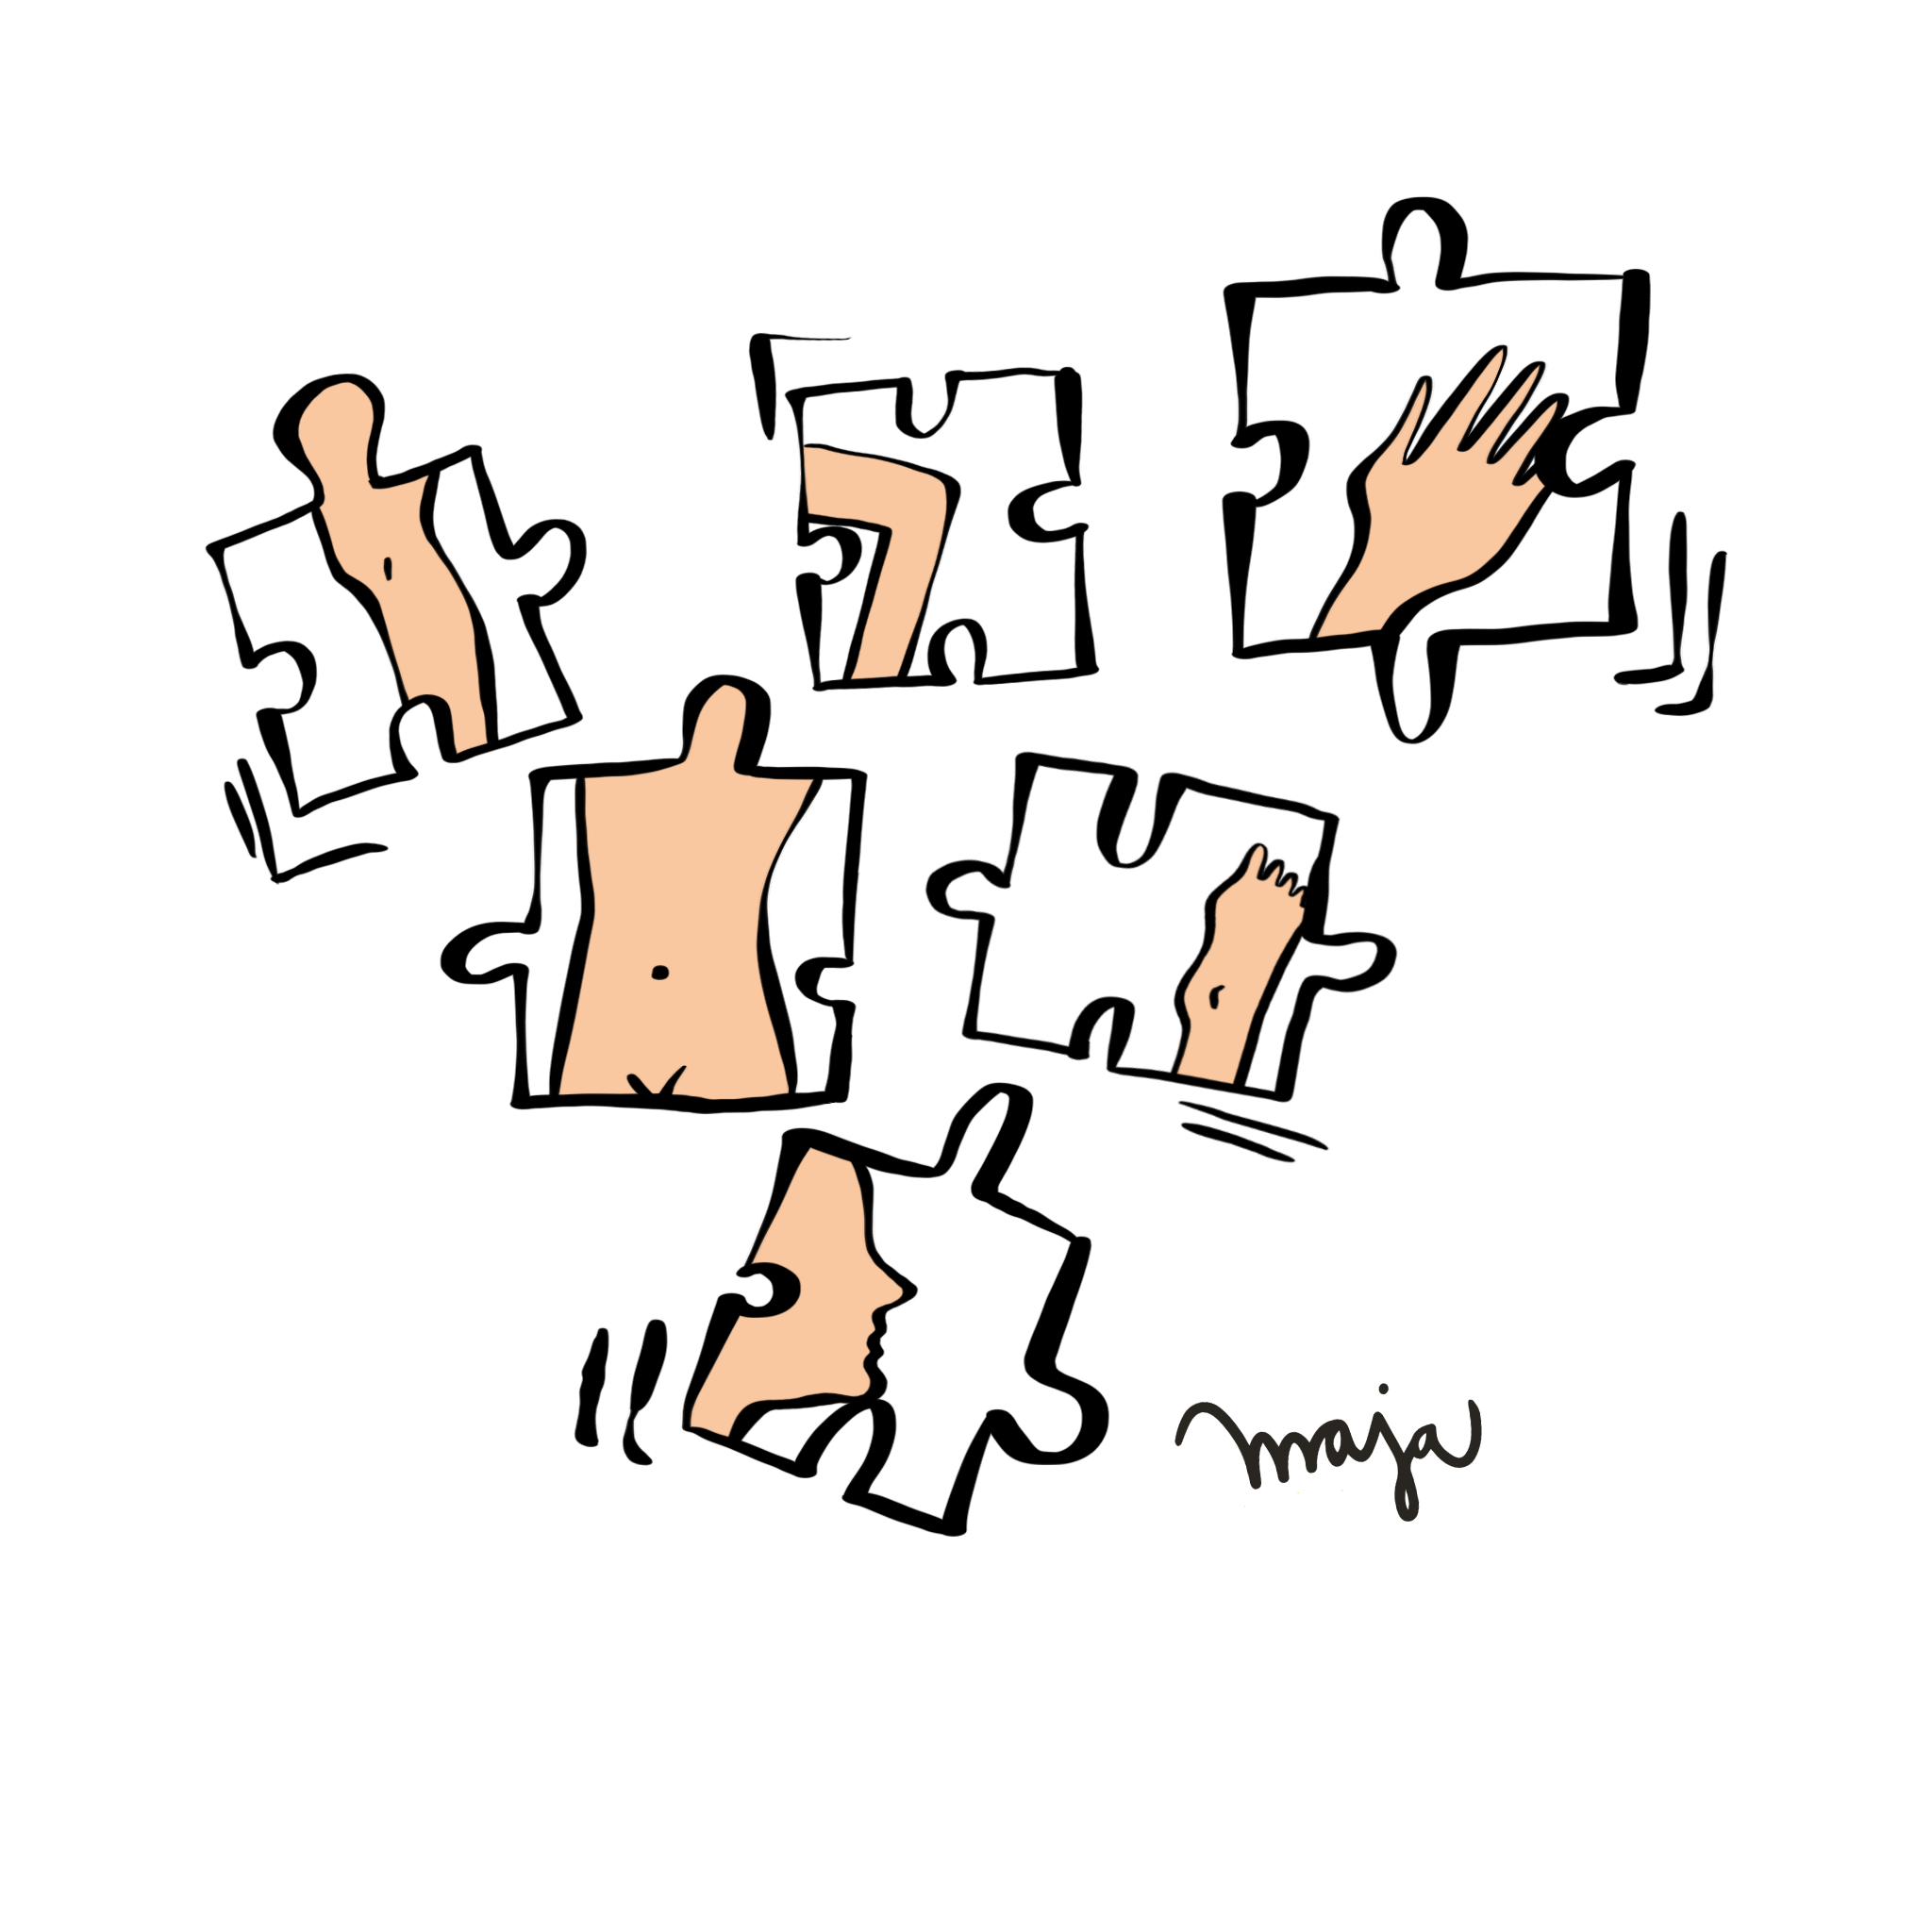 pussel-bitar-i-helhet-illustration-maja-larsson